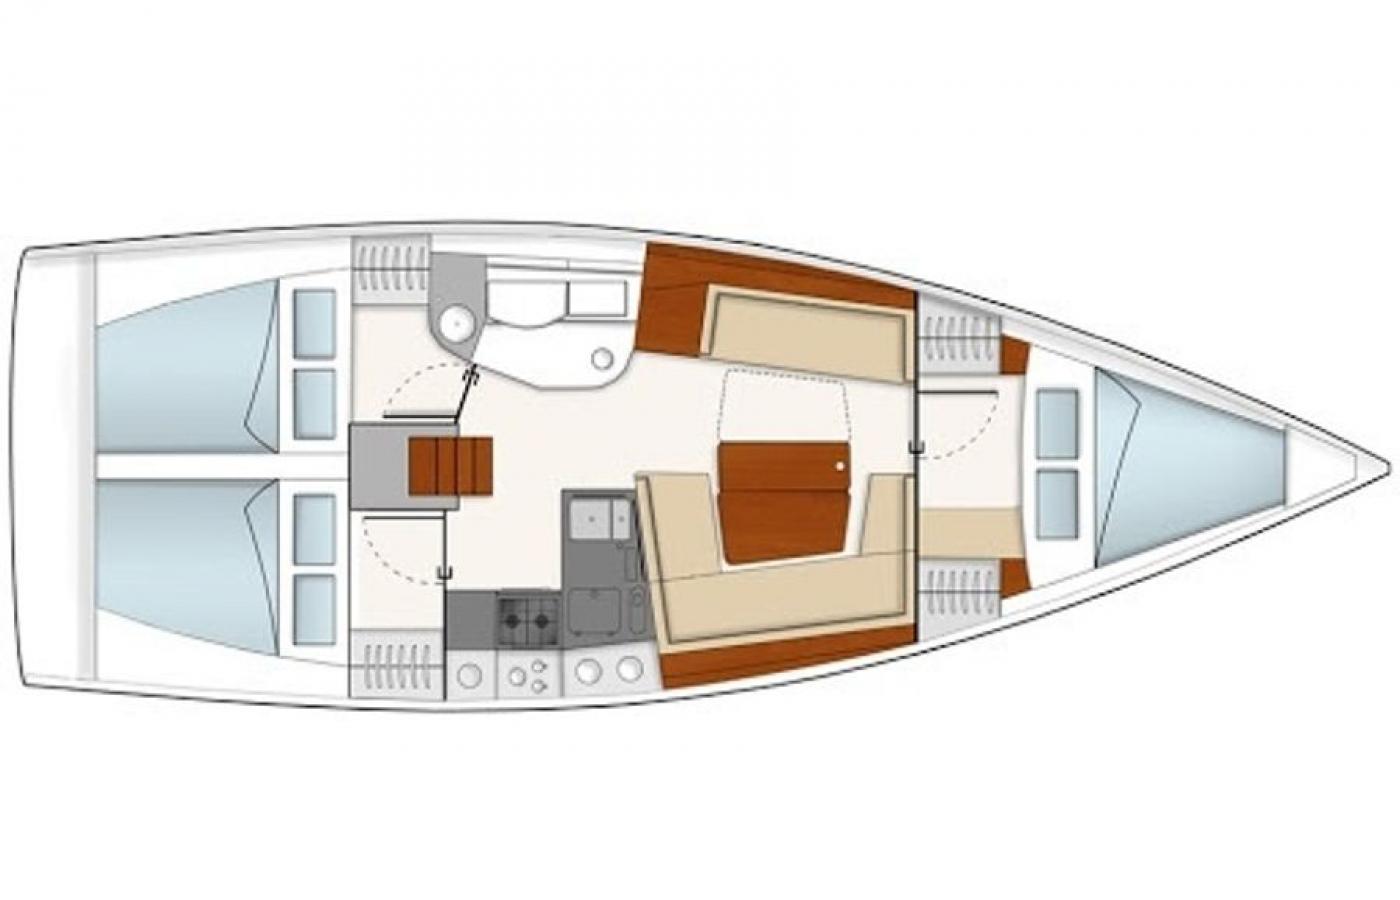 Hanse 385 - Sernaka layout